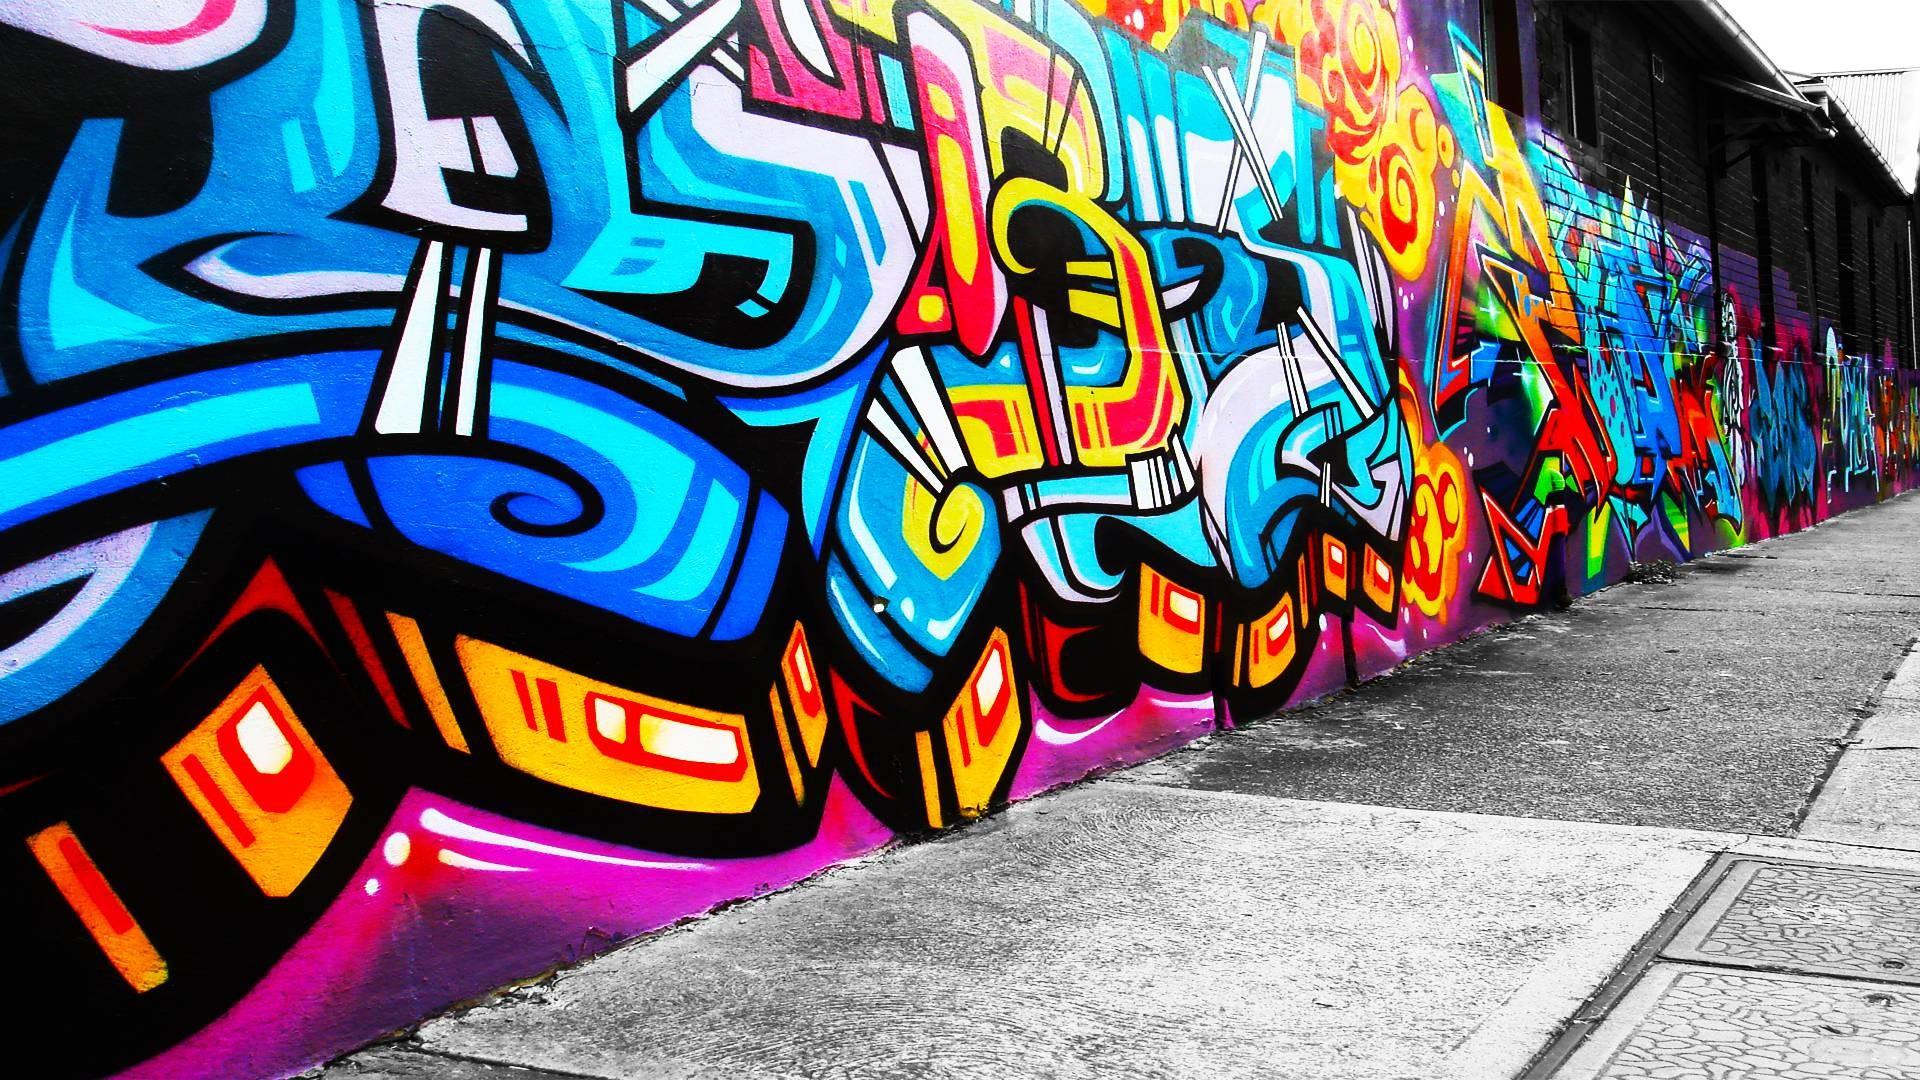 graffiti bright colors best hd wallpaper